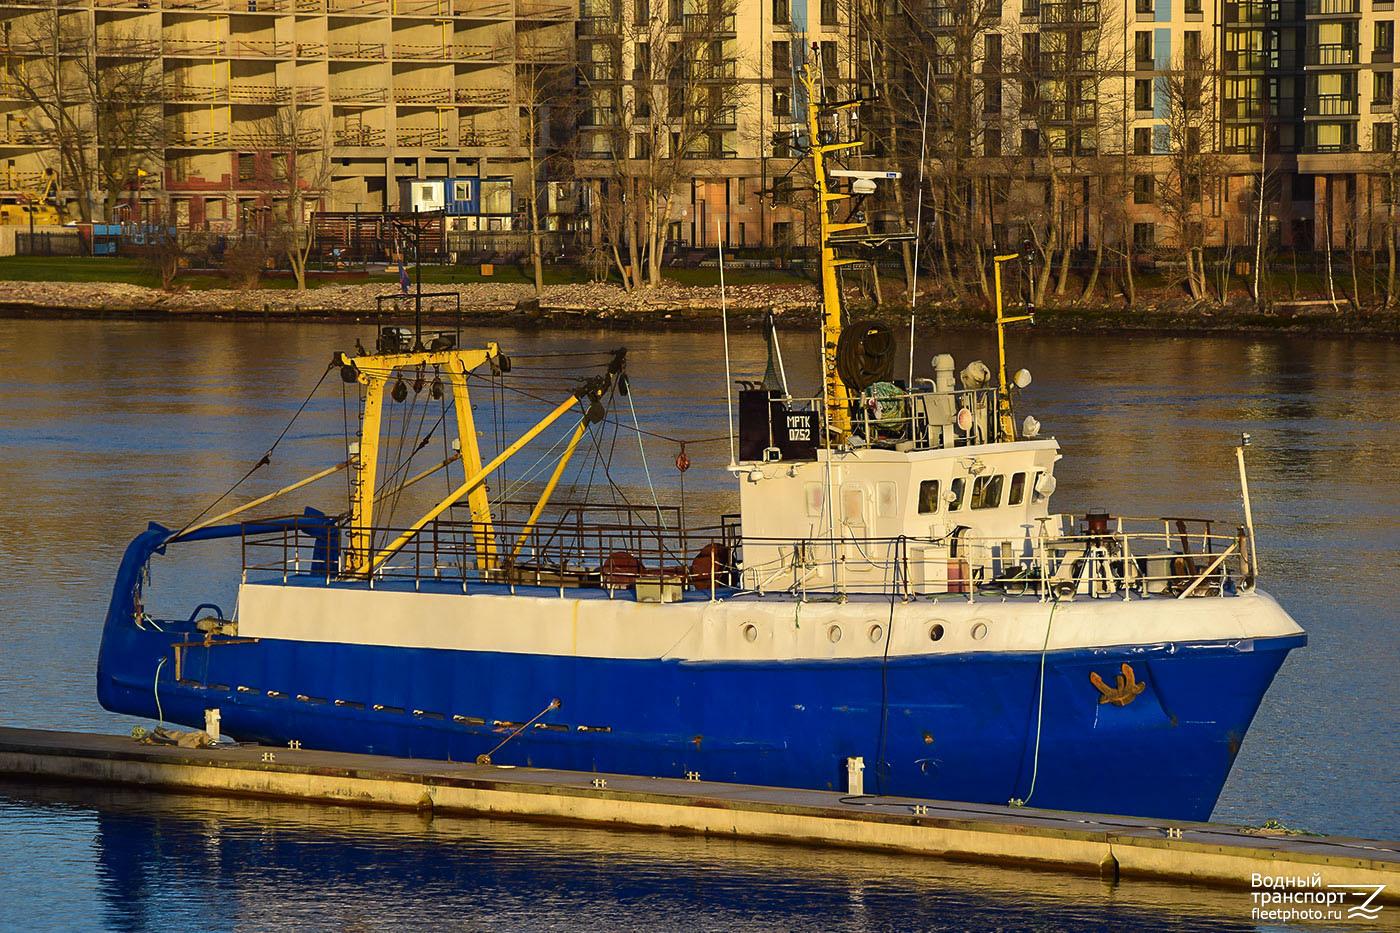 Фото судна мртк типа балтика